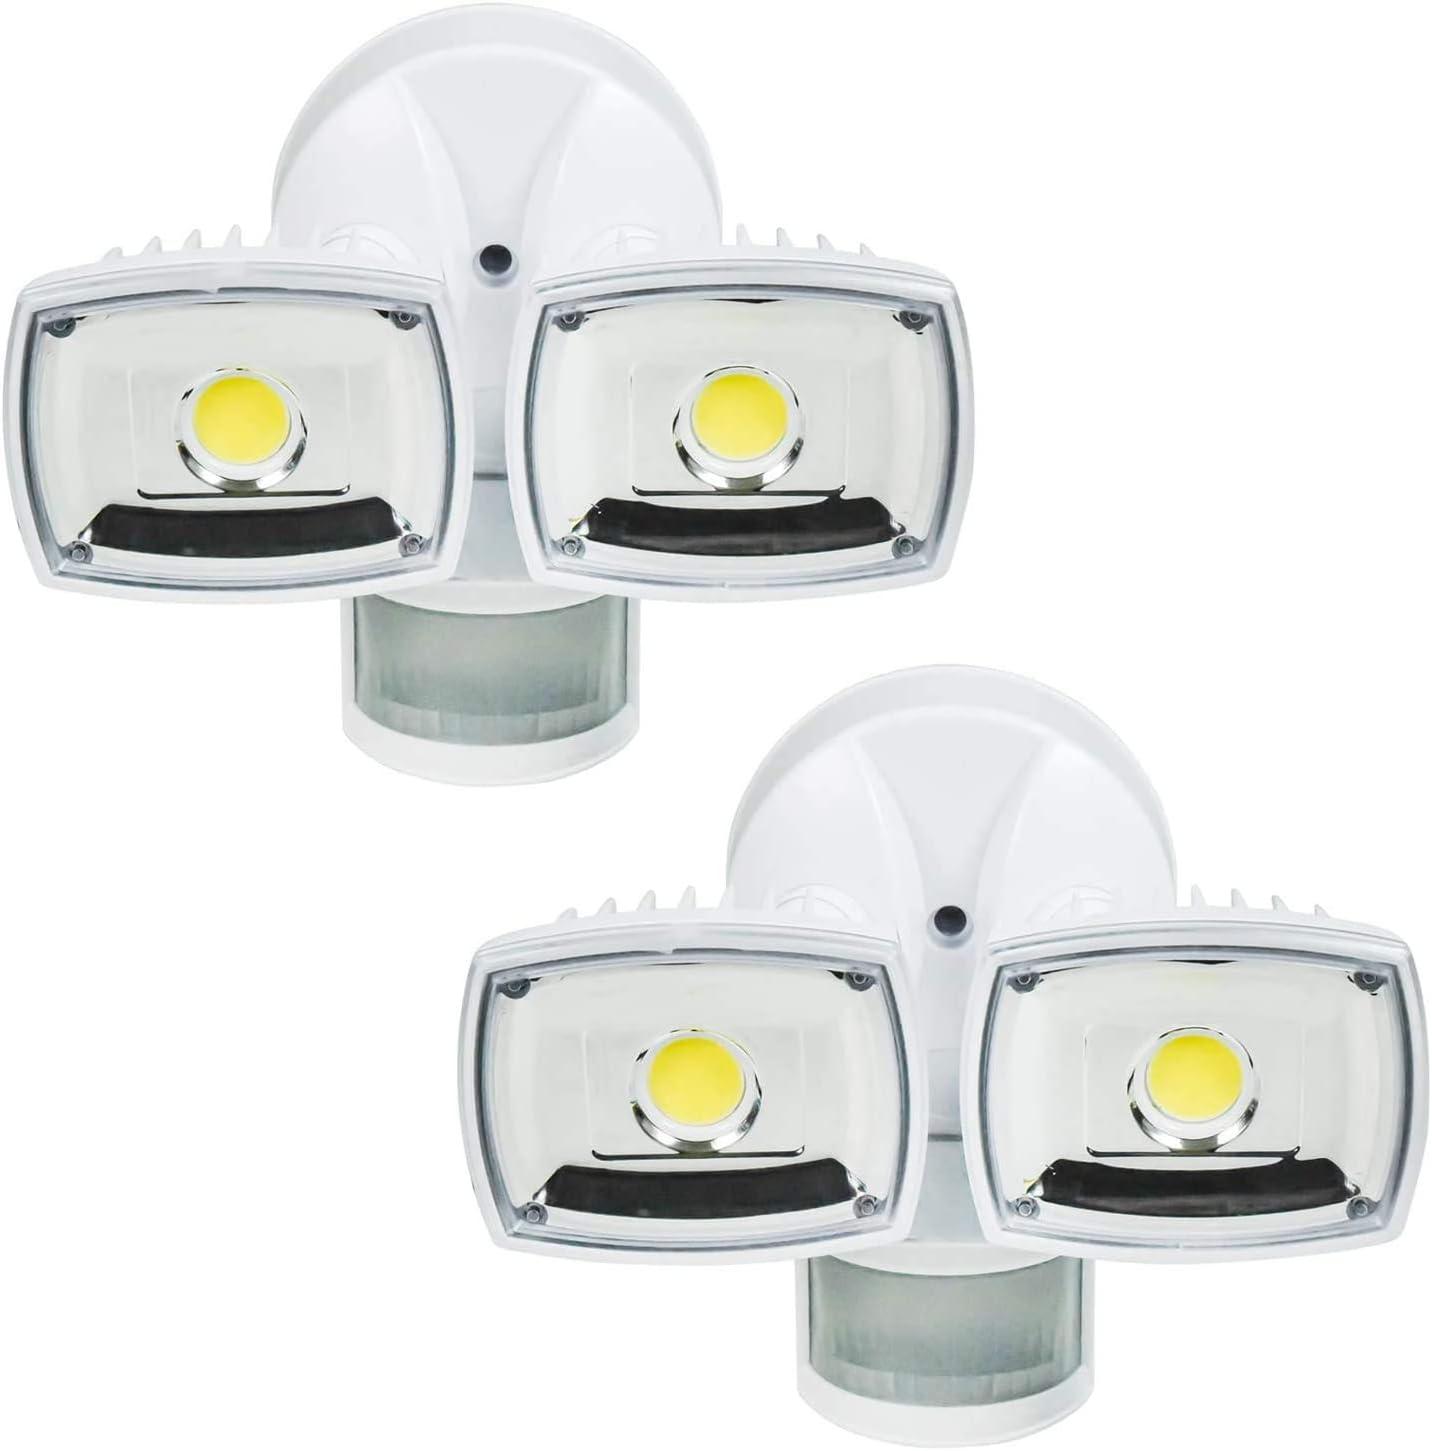 Home Zone Security Motion Sensor Light - Outdoor Weatherproof Ultra Bright 5000K LED Flood Lights (2 Set)